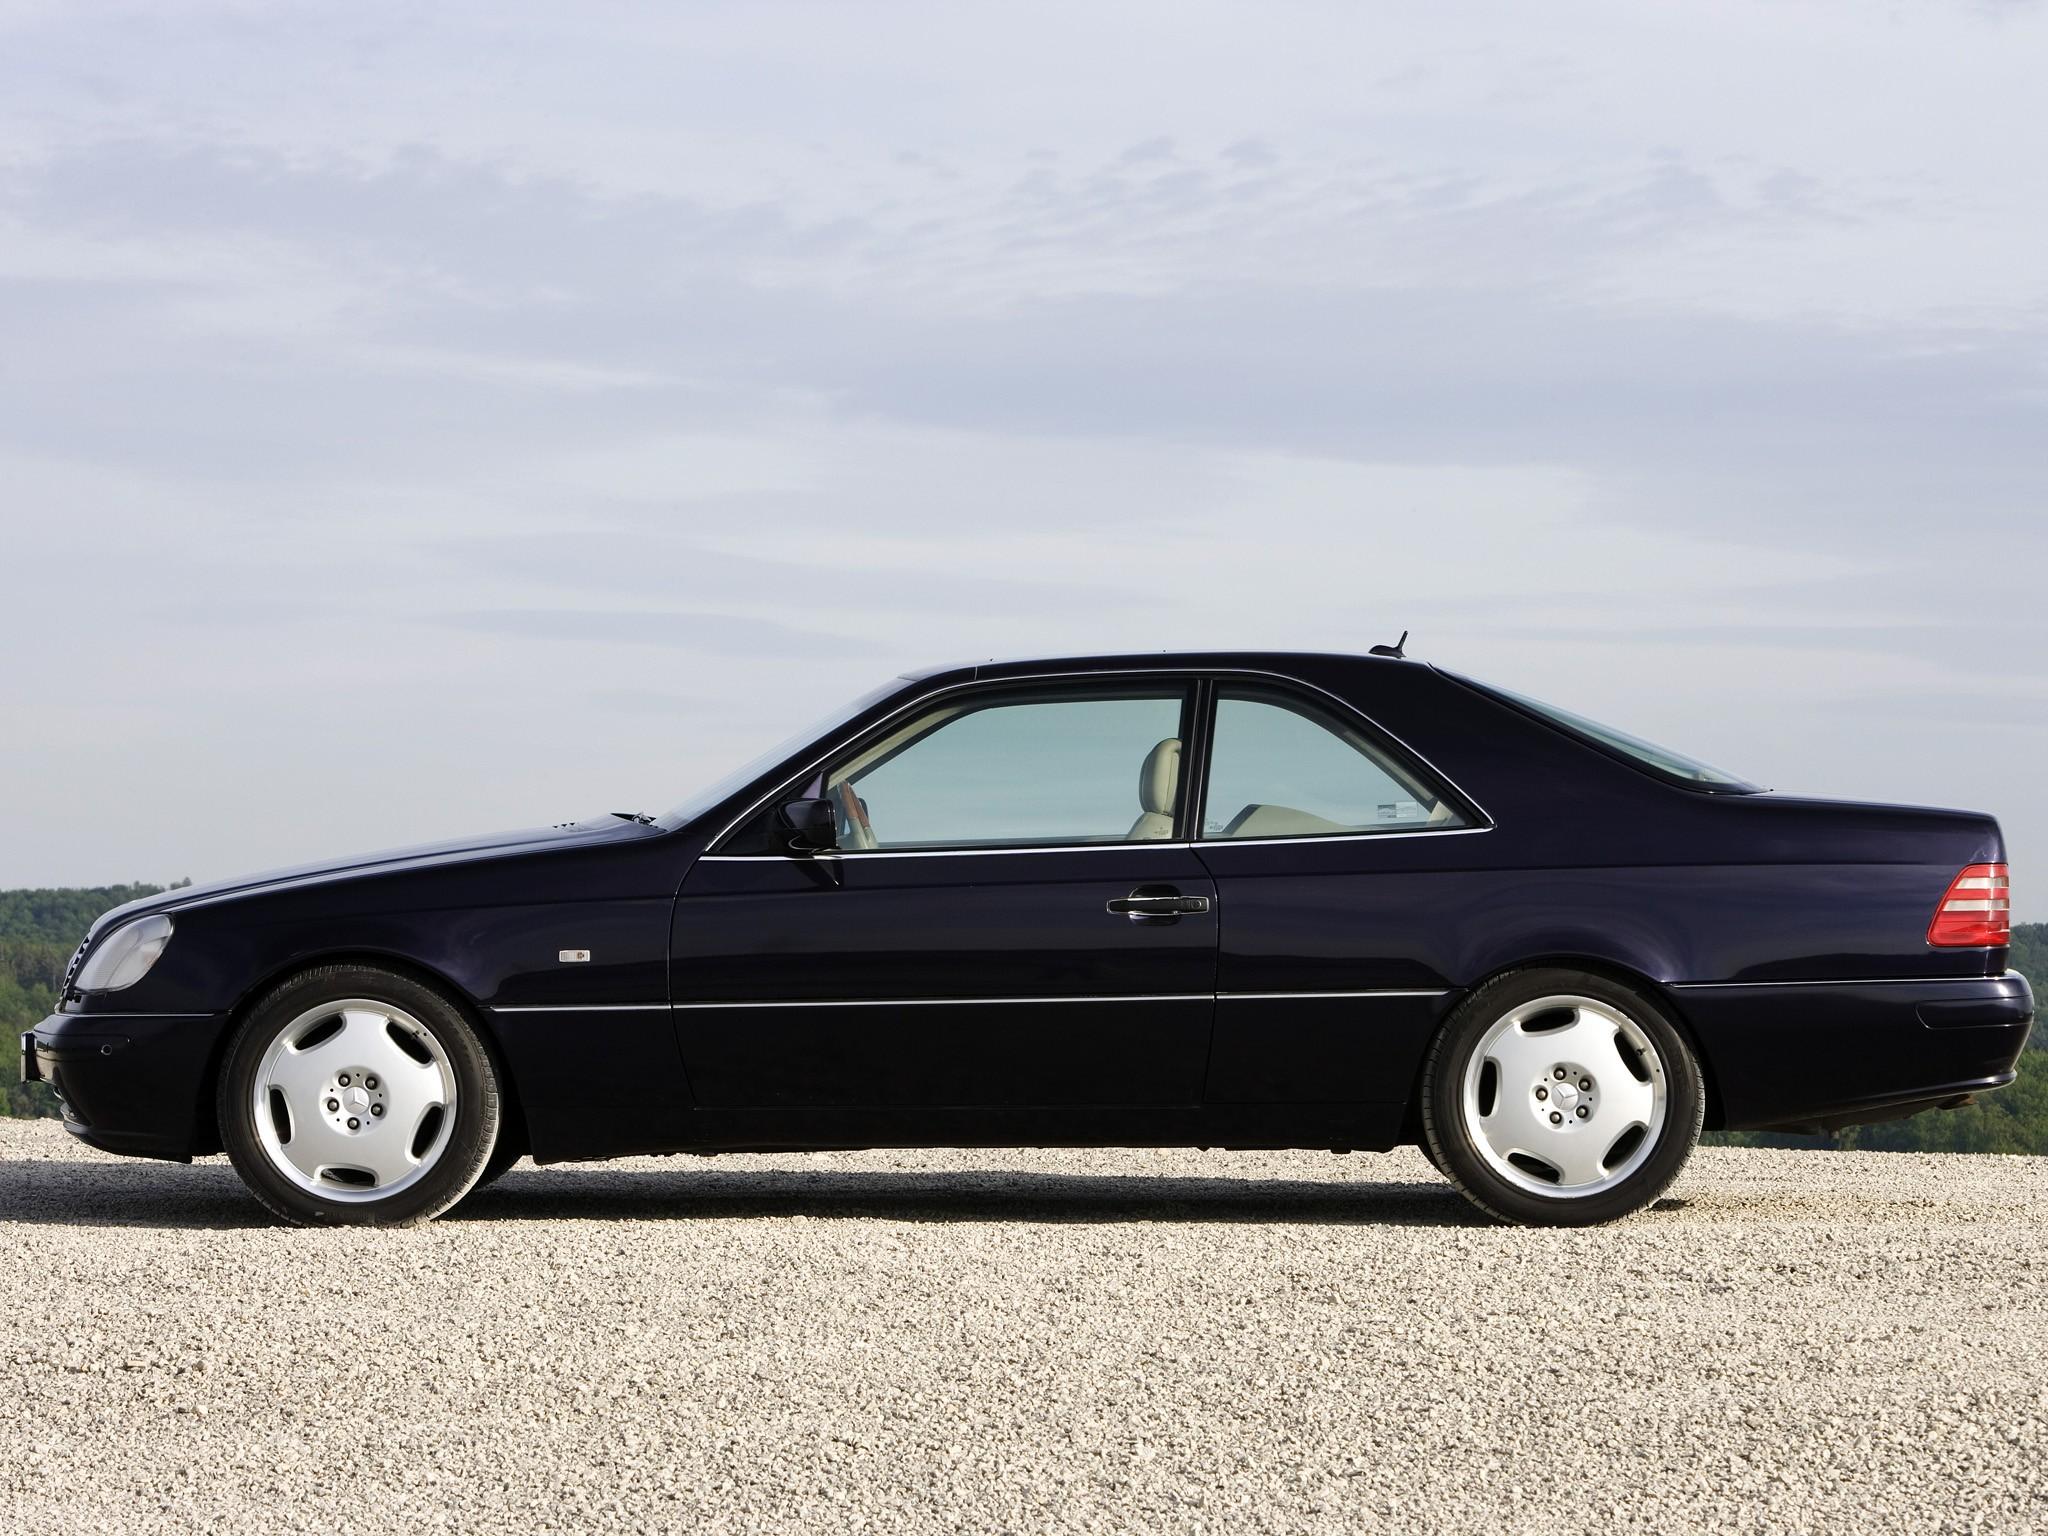 Mercedes-Benz CL-klasse I (C140) 1996 - 1998 Coupe #3